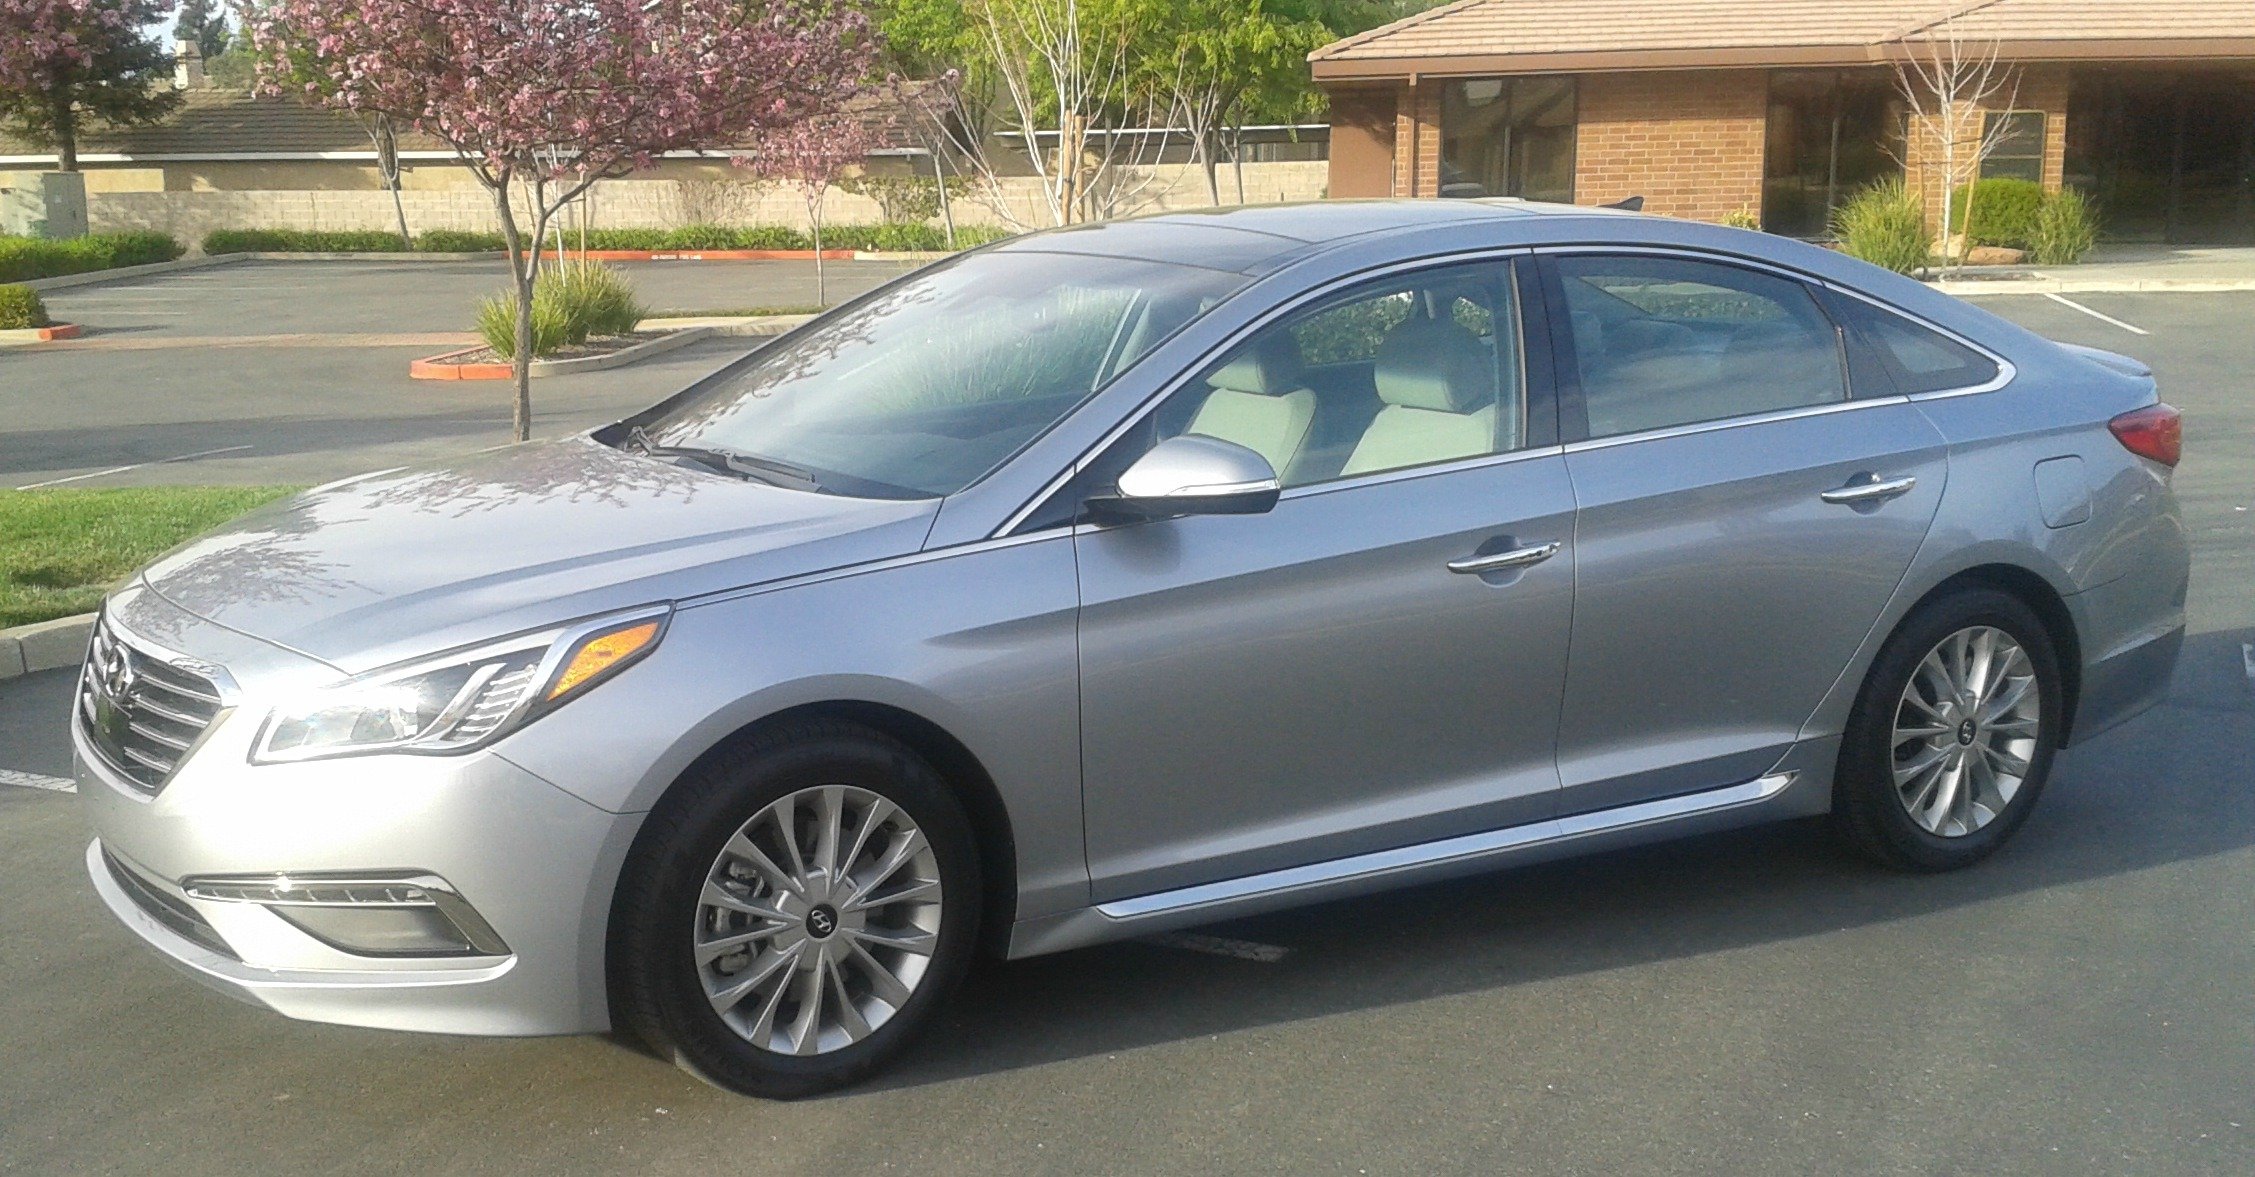 Hyundai Drivetrain Warranty 2015 Hyundai Sonata Delivers